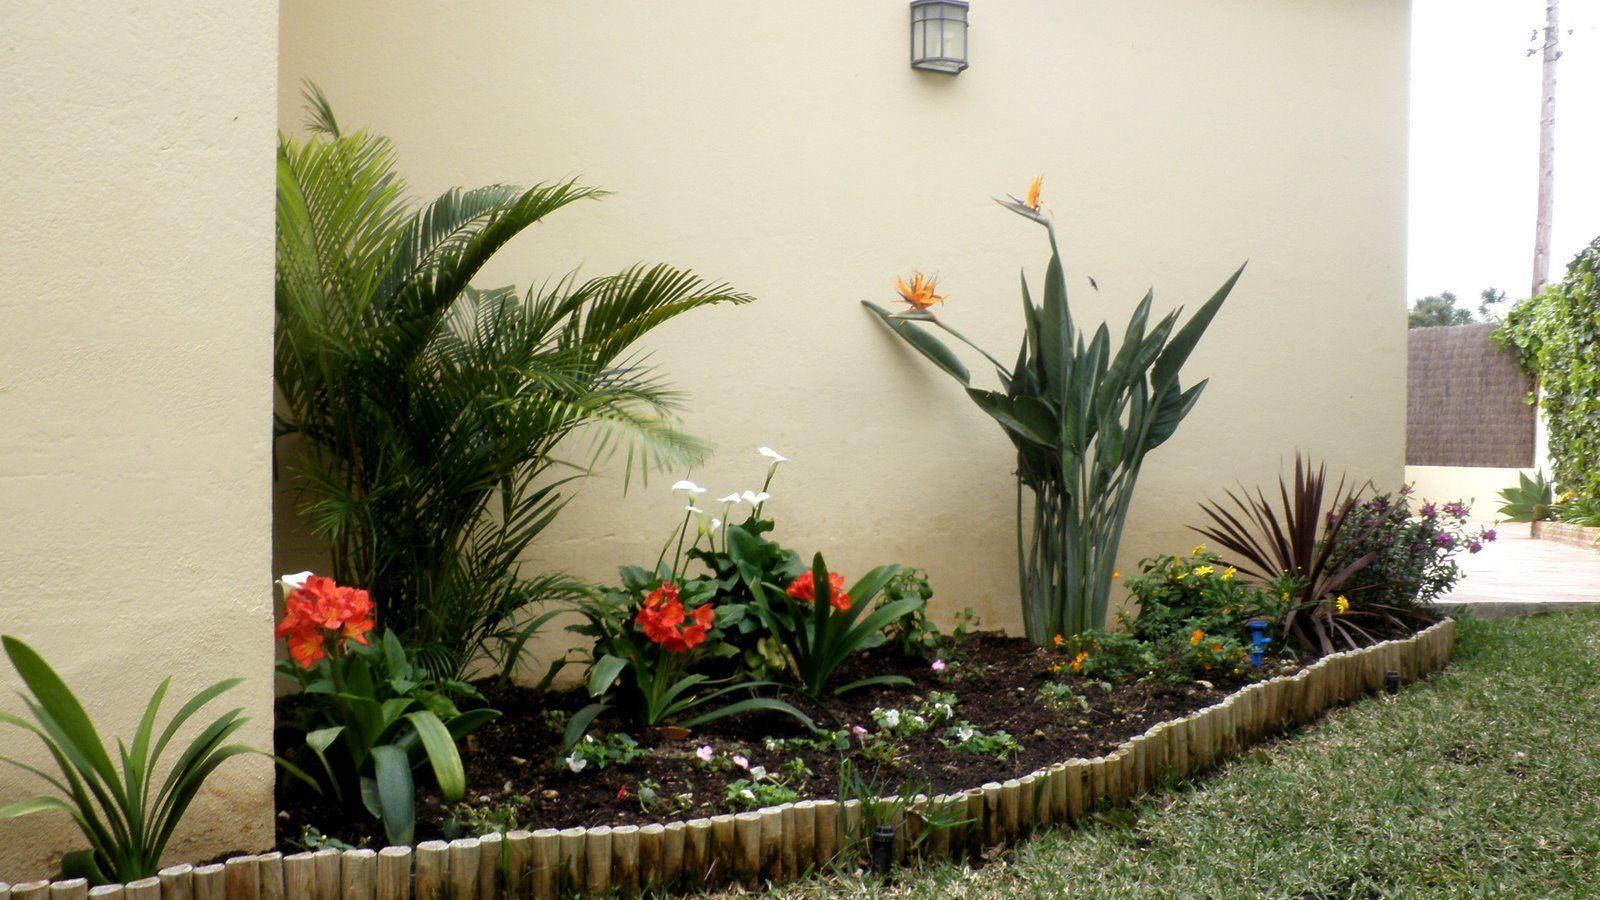 Pin de solange pereira gama en jardim pinterest dise o for Patios y jardines modernos